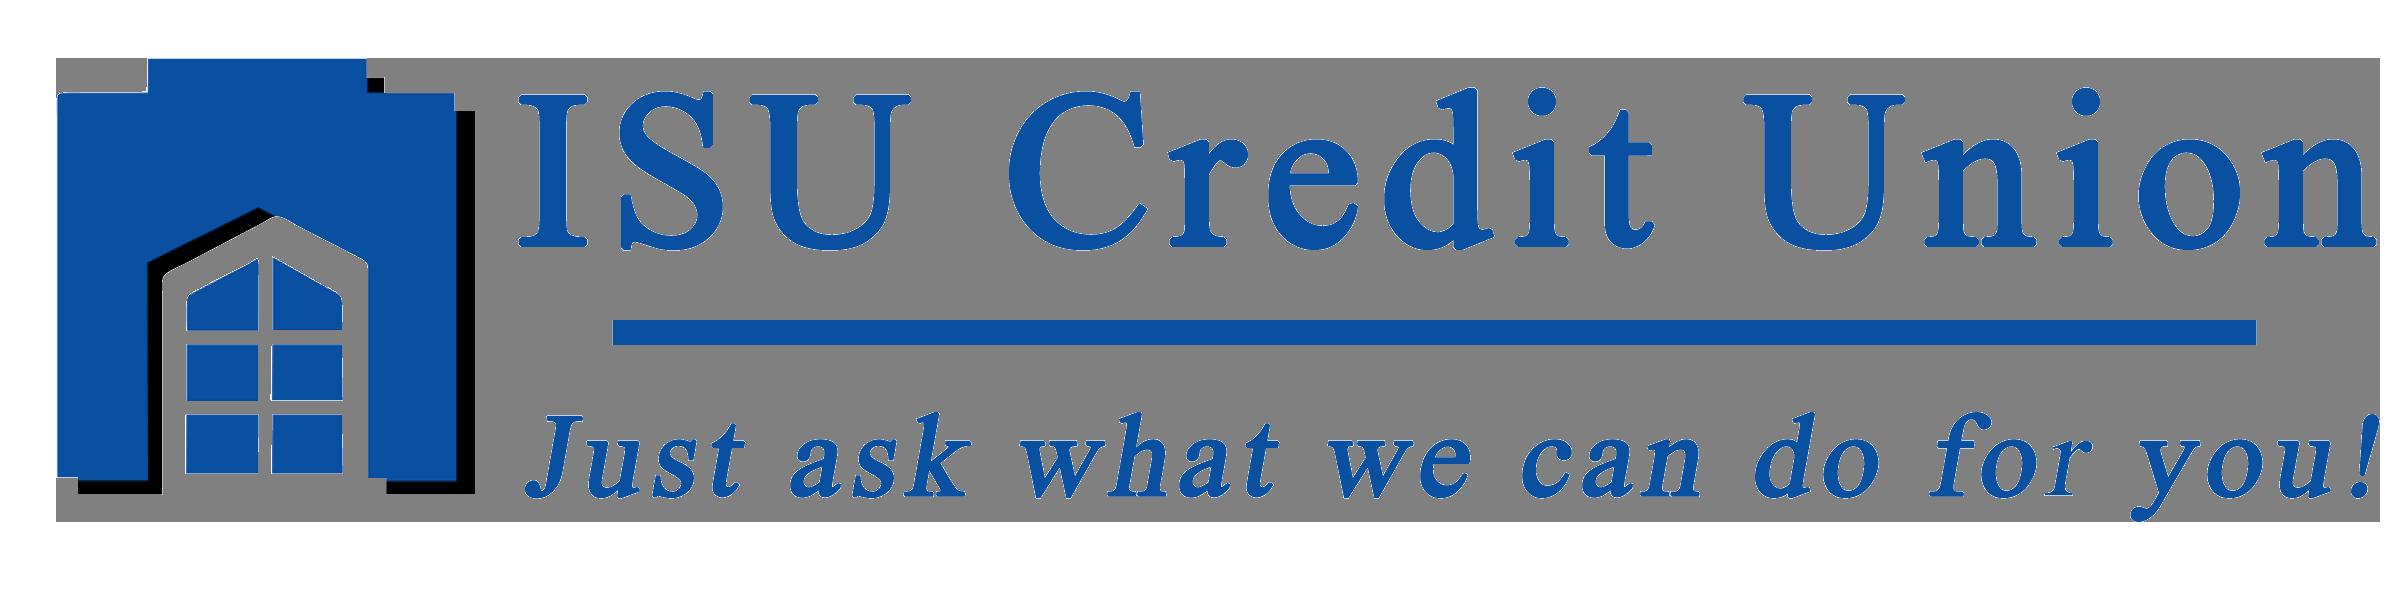 indiana state university credit union